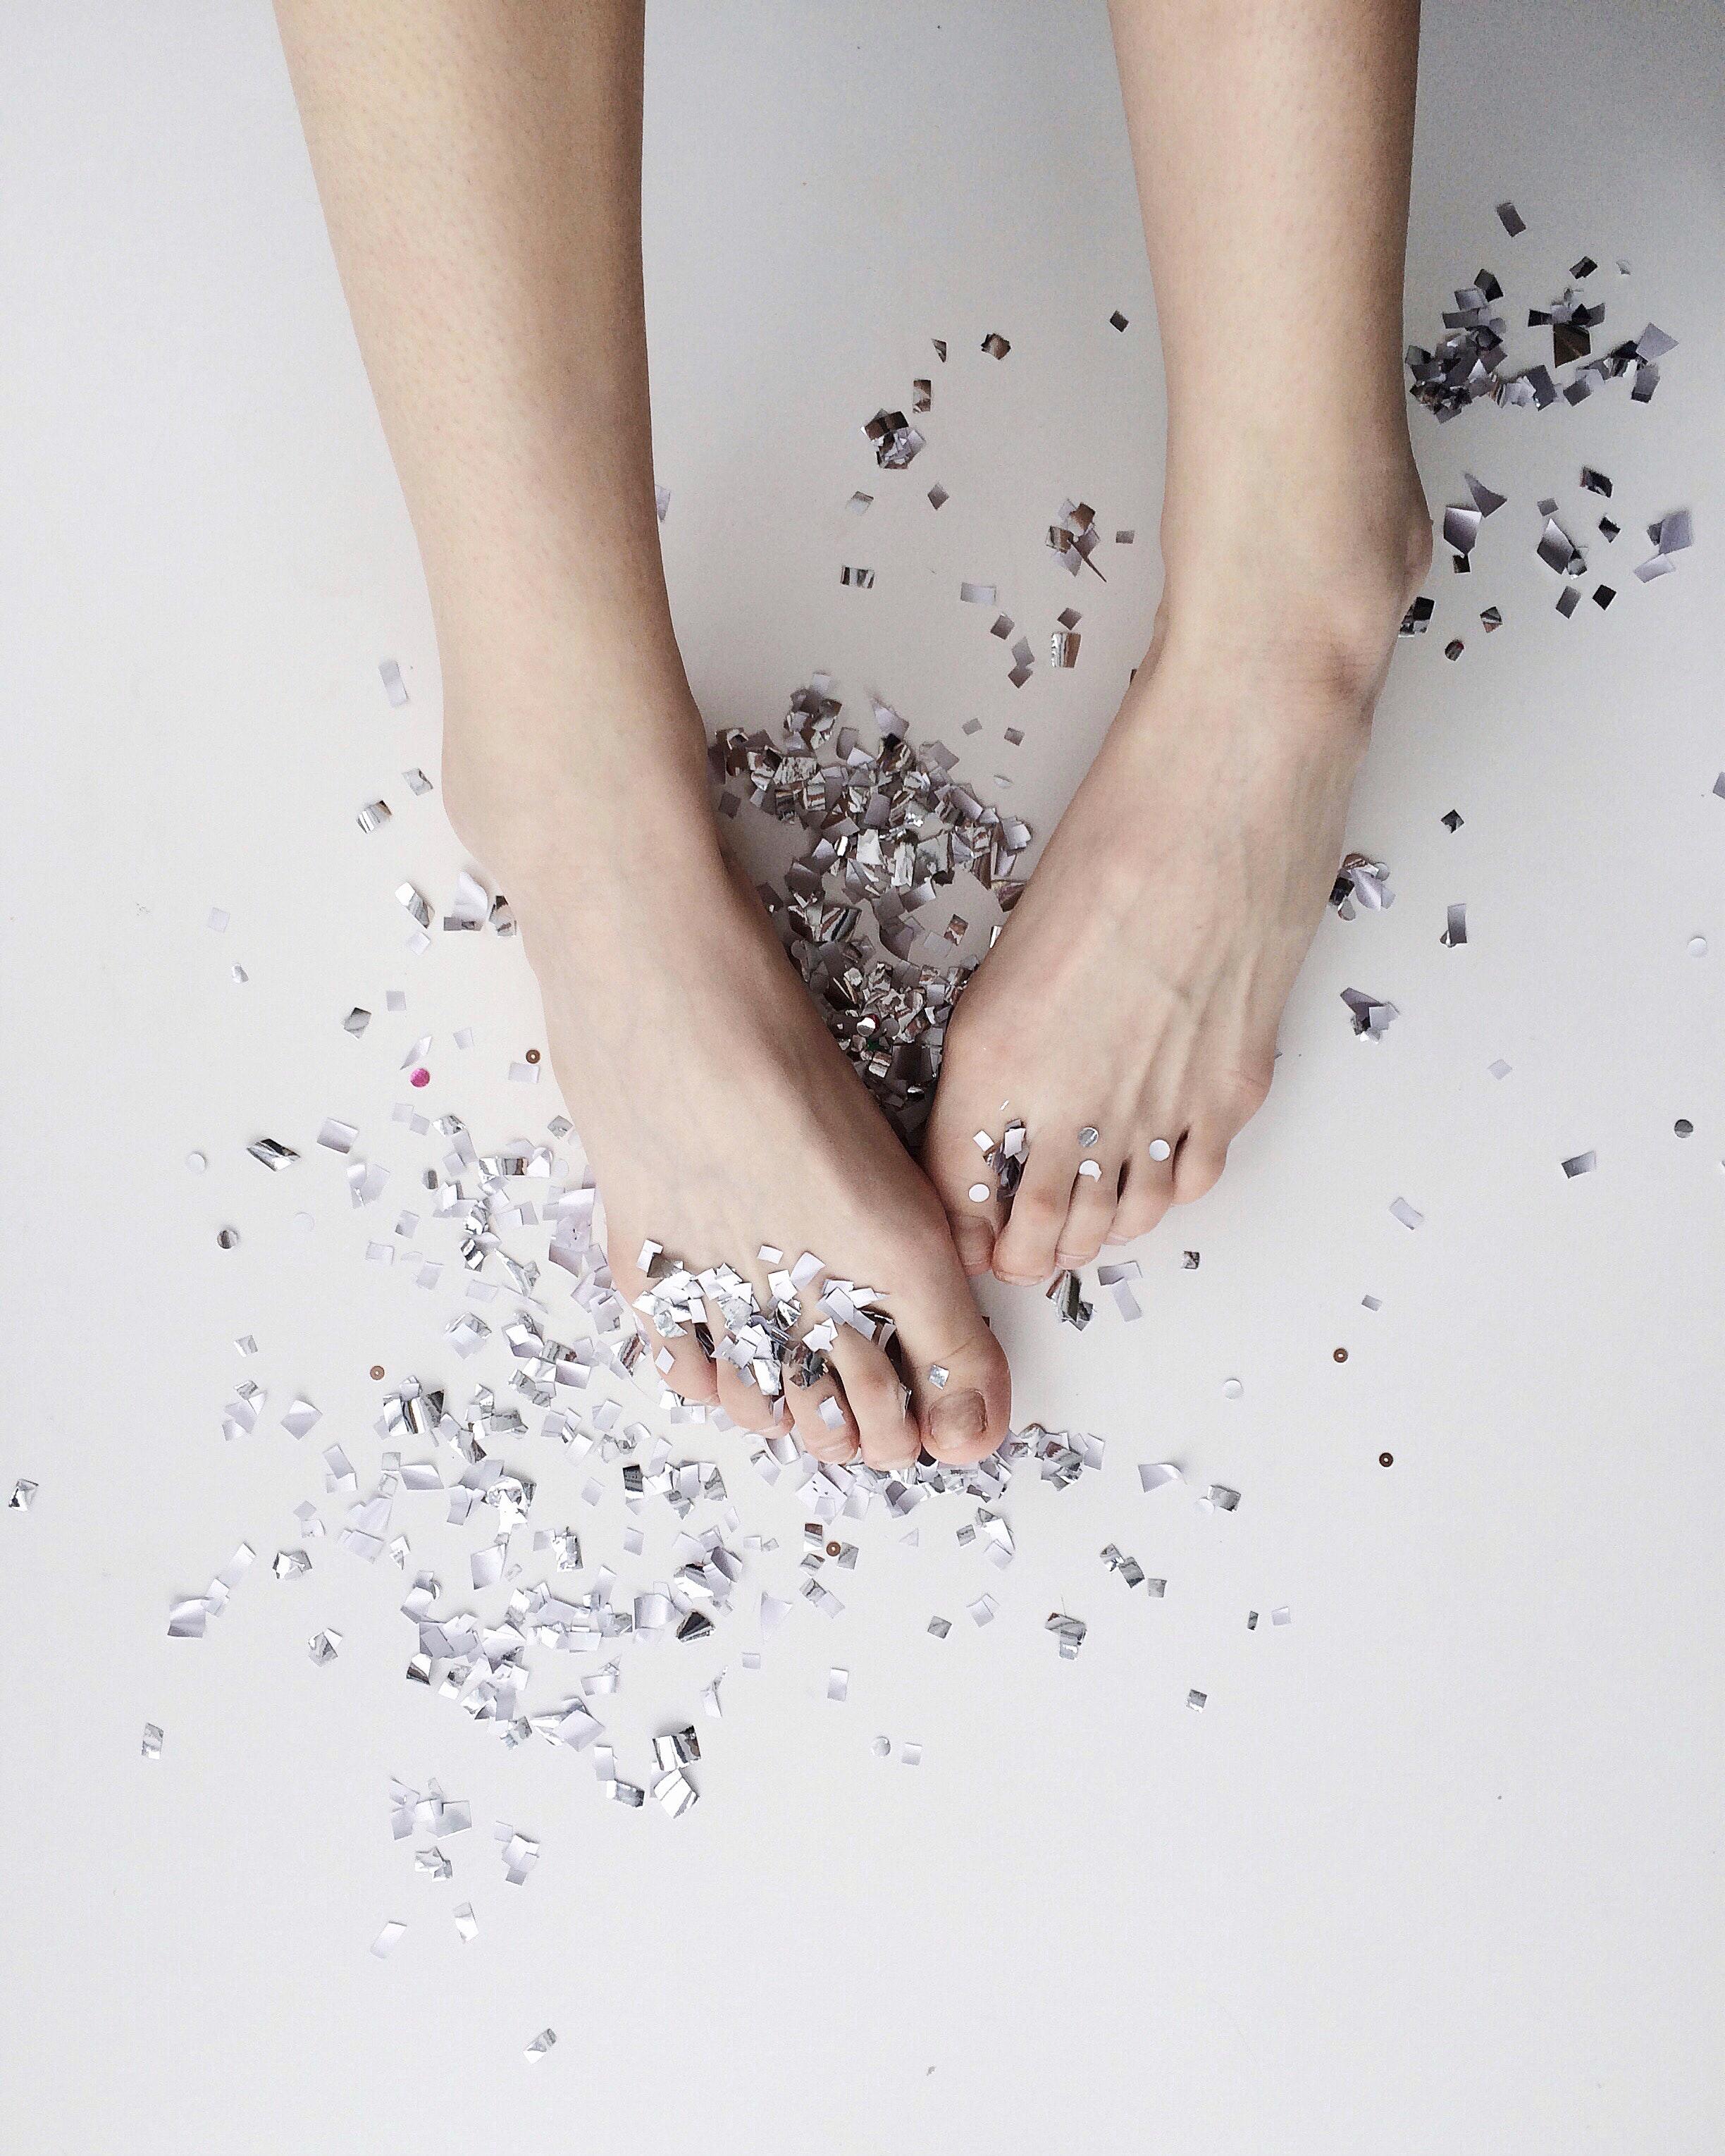 10 Reviewedamp; In 2019Walkjogrun Best Barefoot Rated Sandals R4L5A3jq